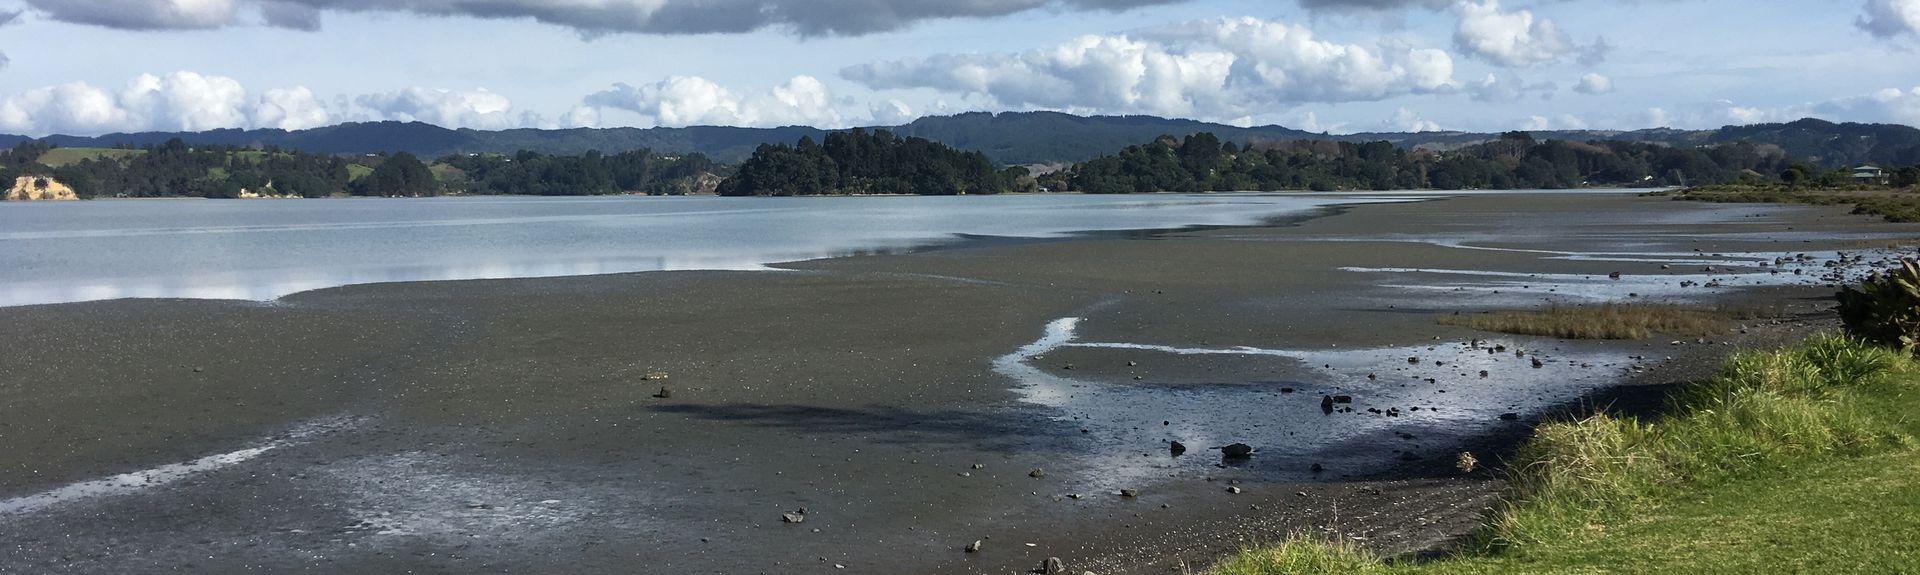 Tirohanga, Opotiki, Bay of Plenty Region, New Zealand